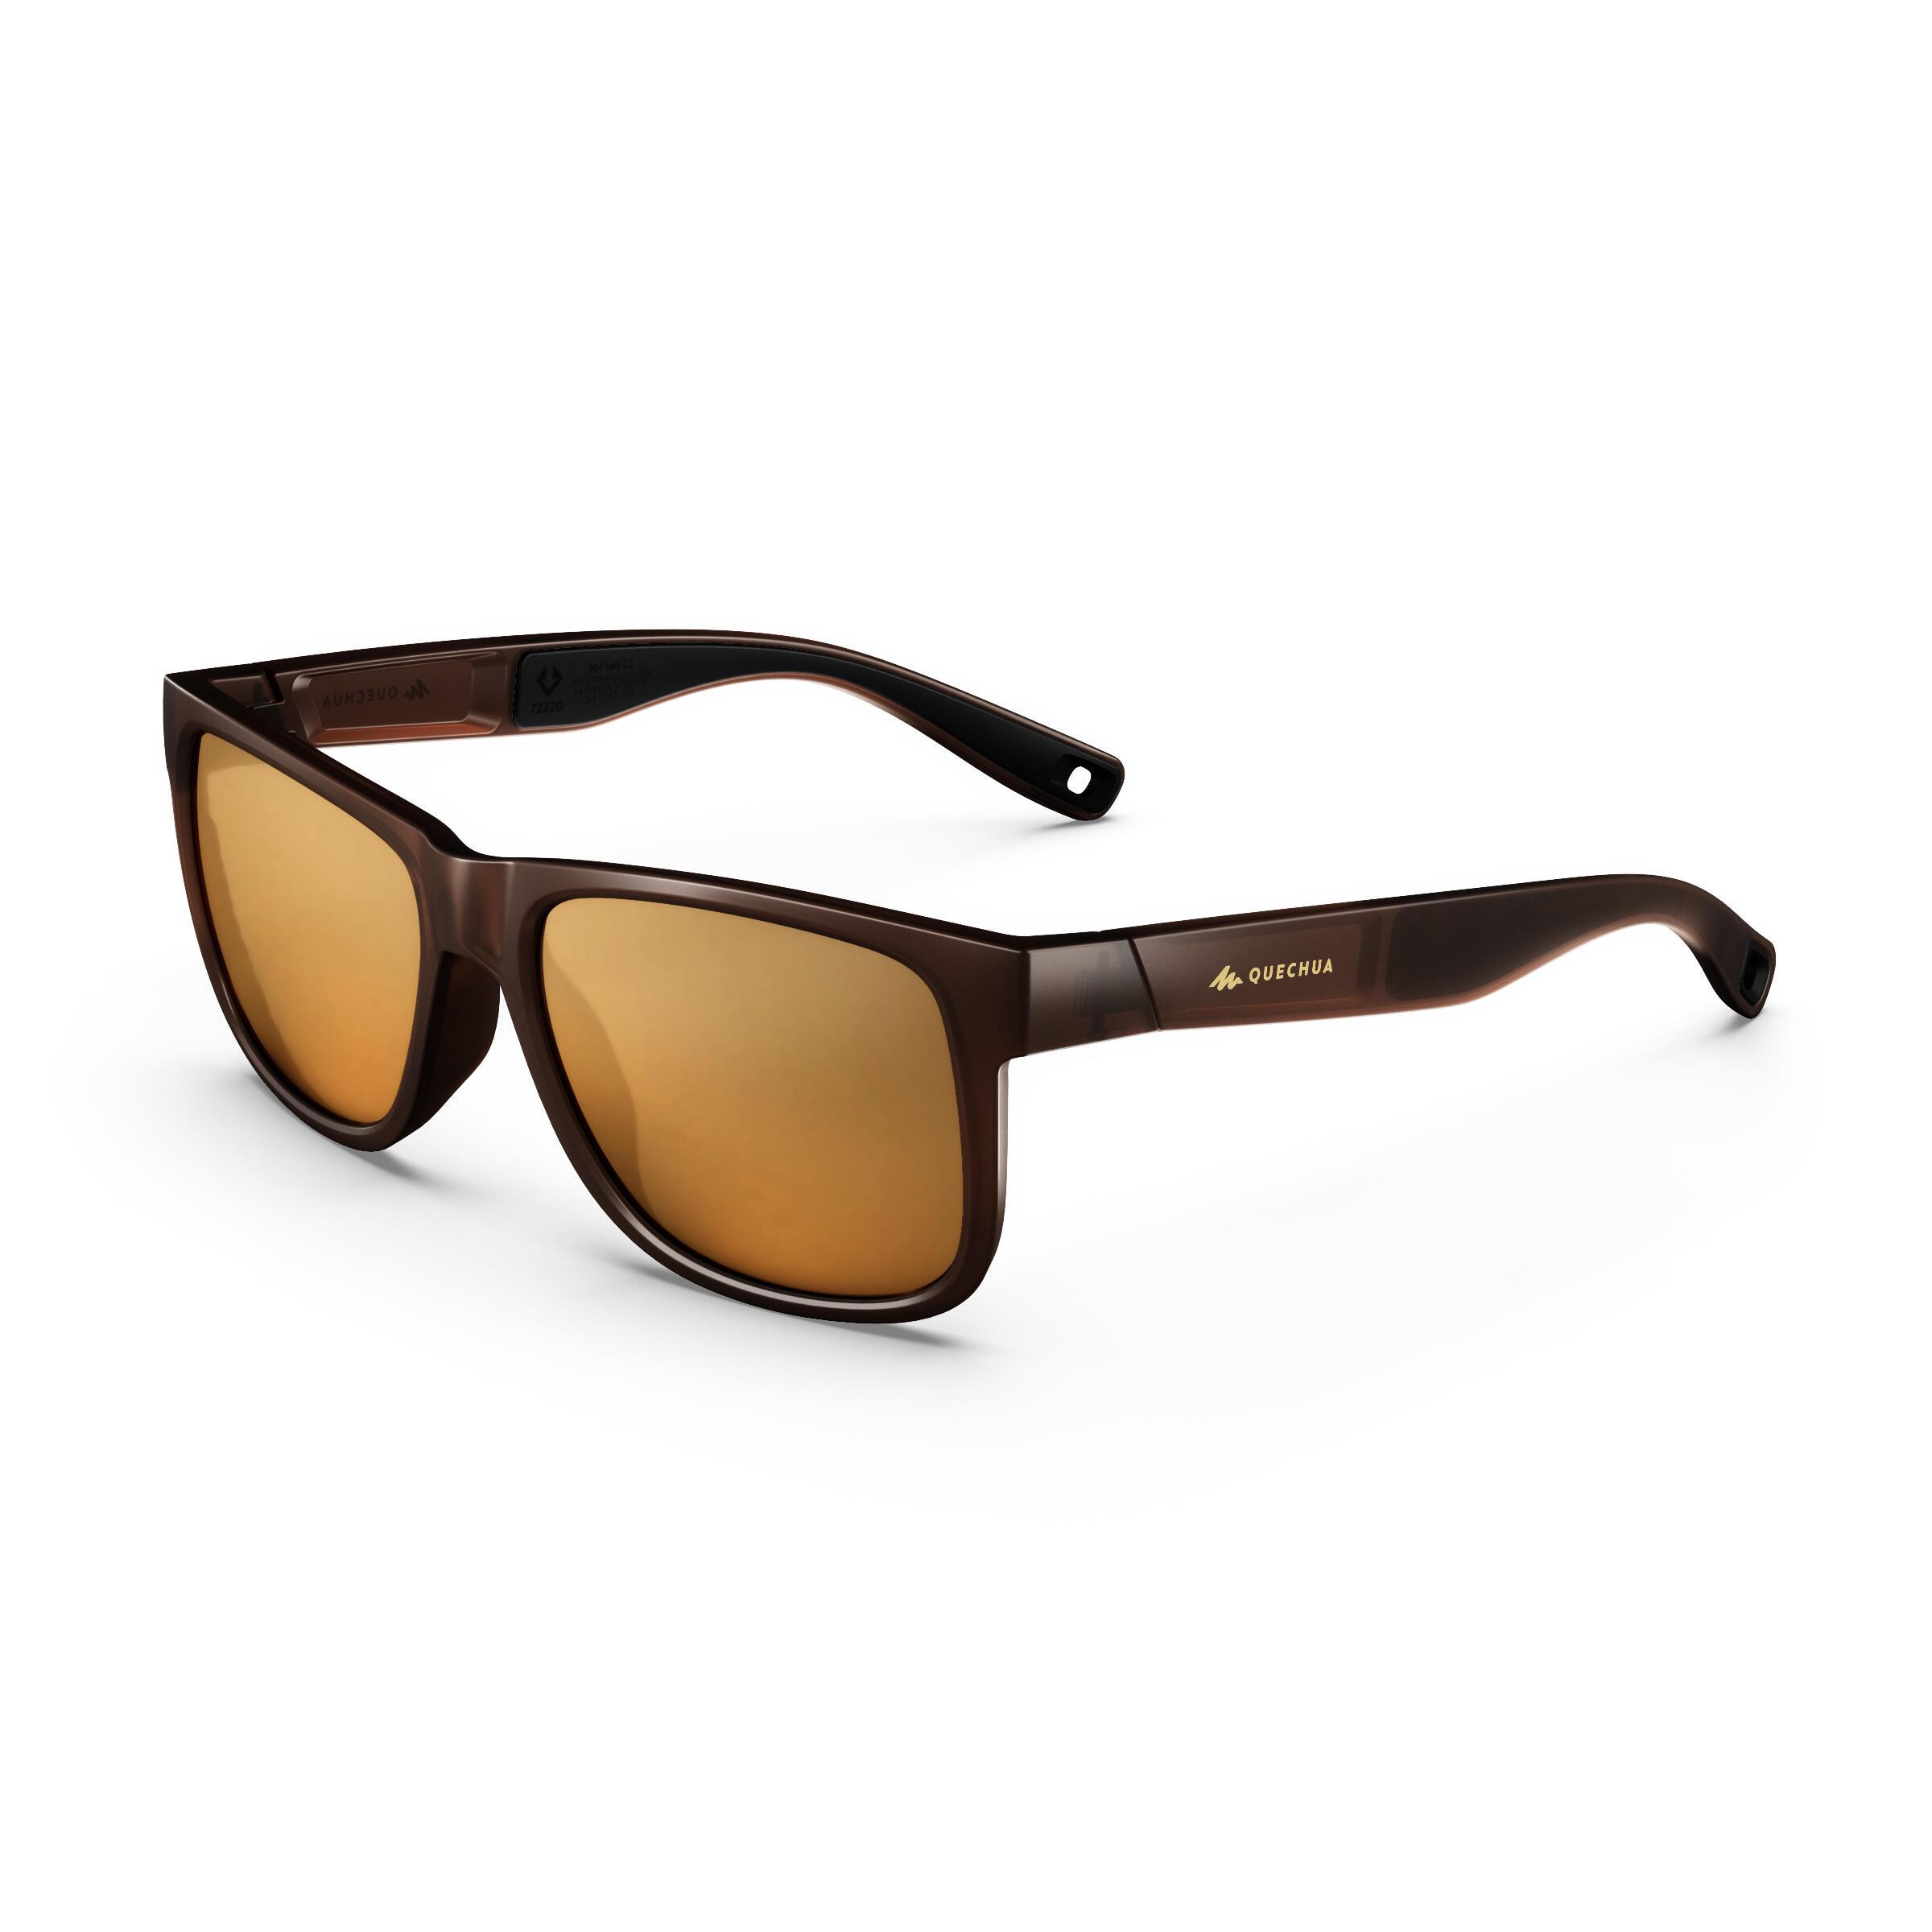 Sonnenbrille Wandern MH140Kategorie 3 Erwachseneschwarz | Accessoires > Sonnenbrillen > Sonstige Sonnenbrillen | Quechua